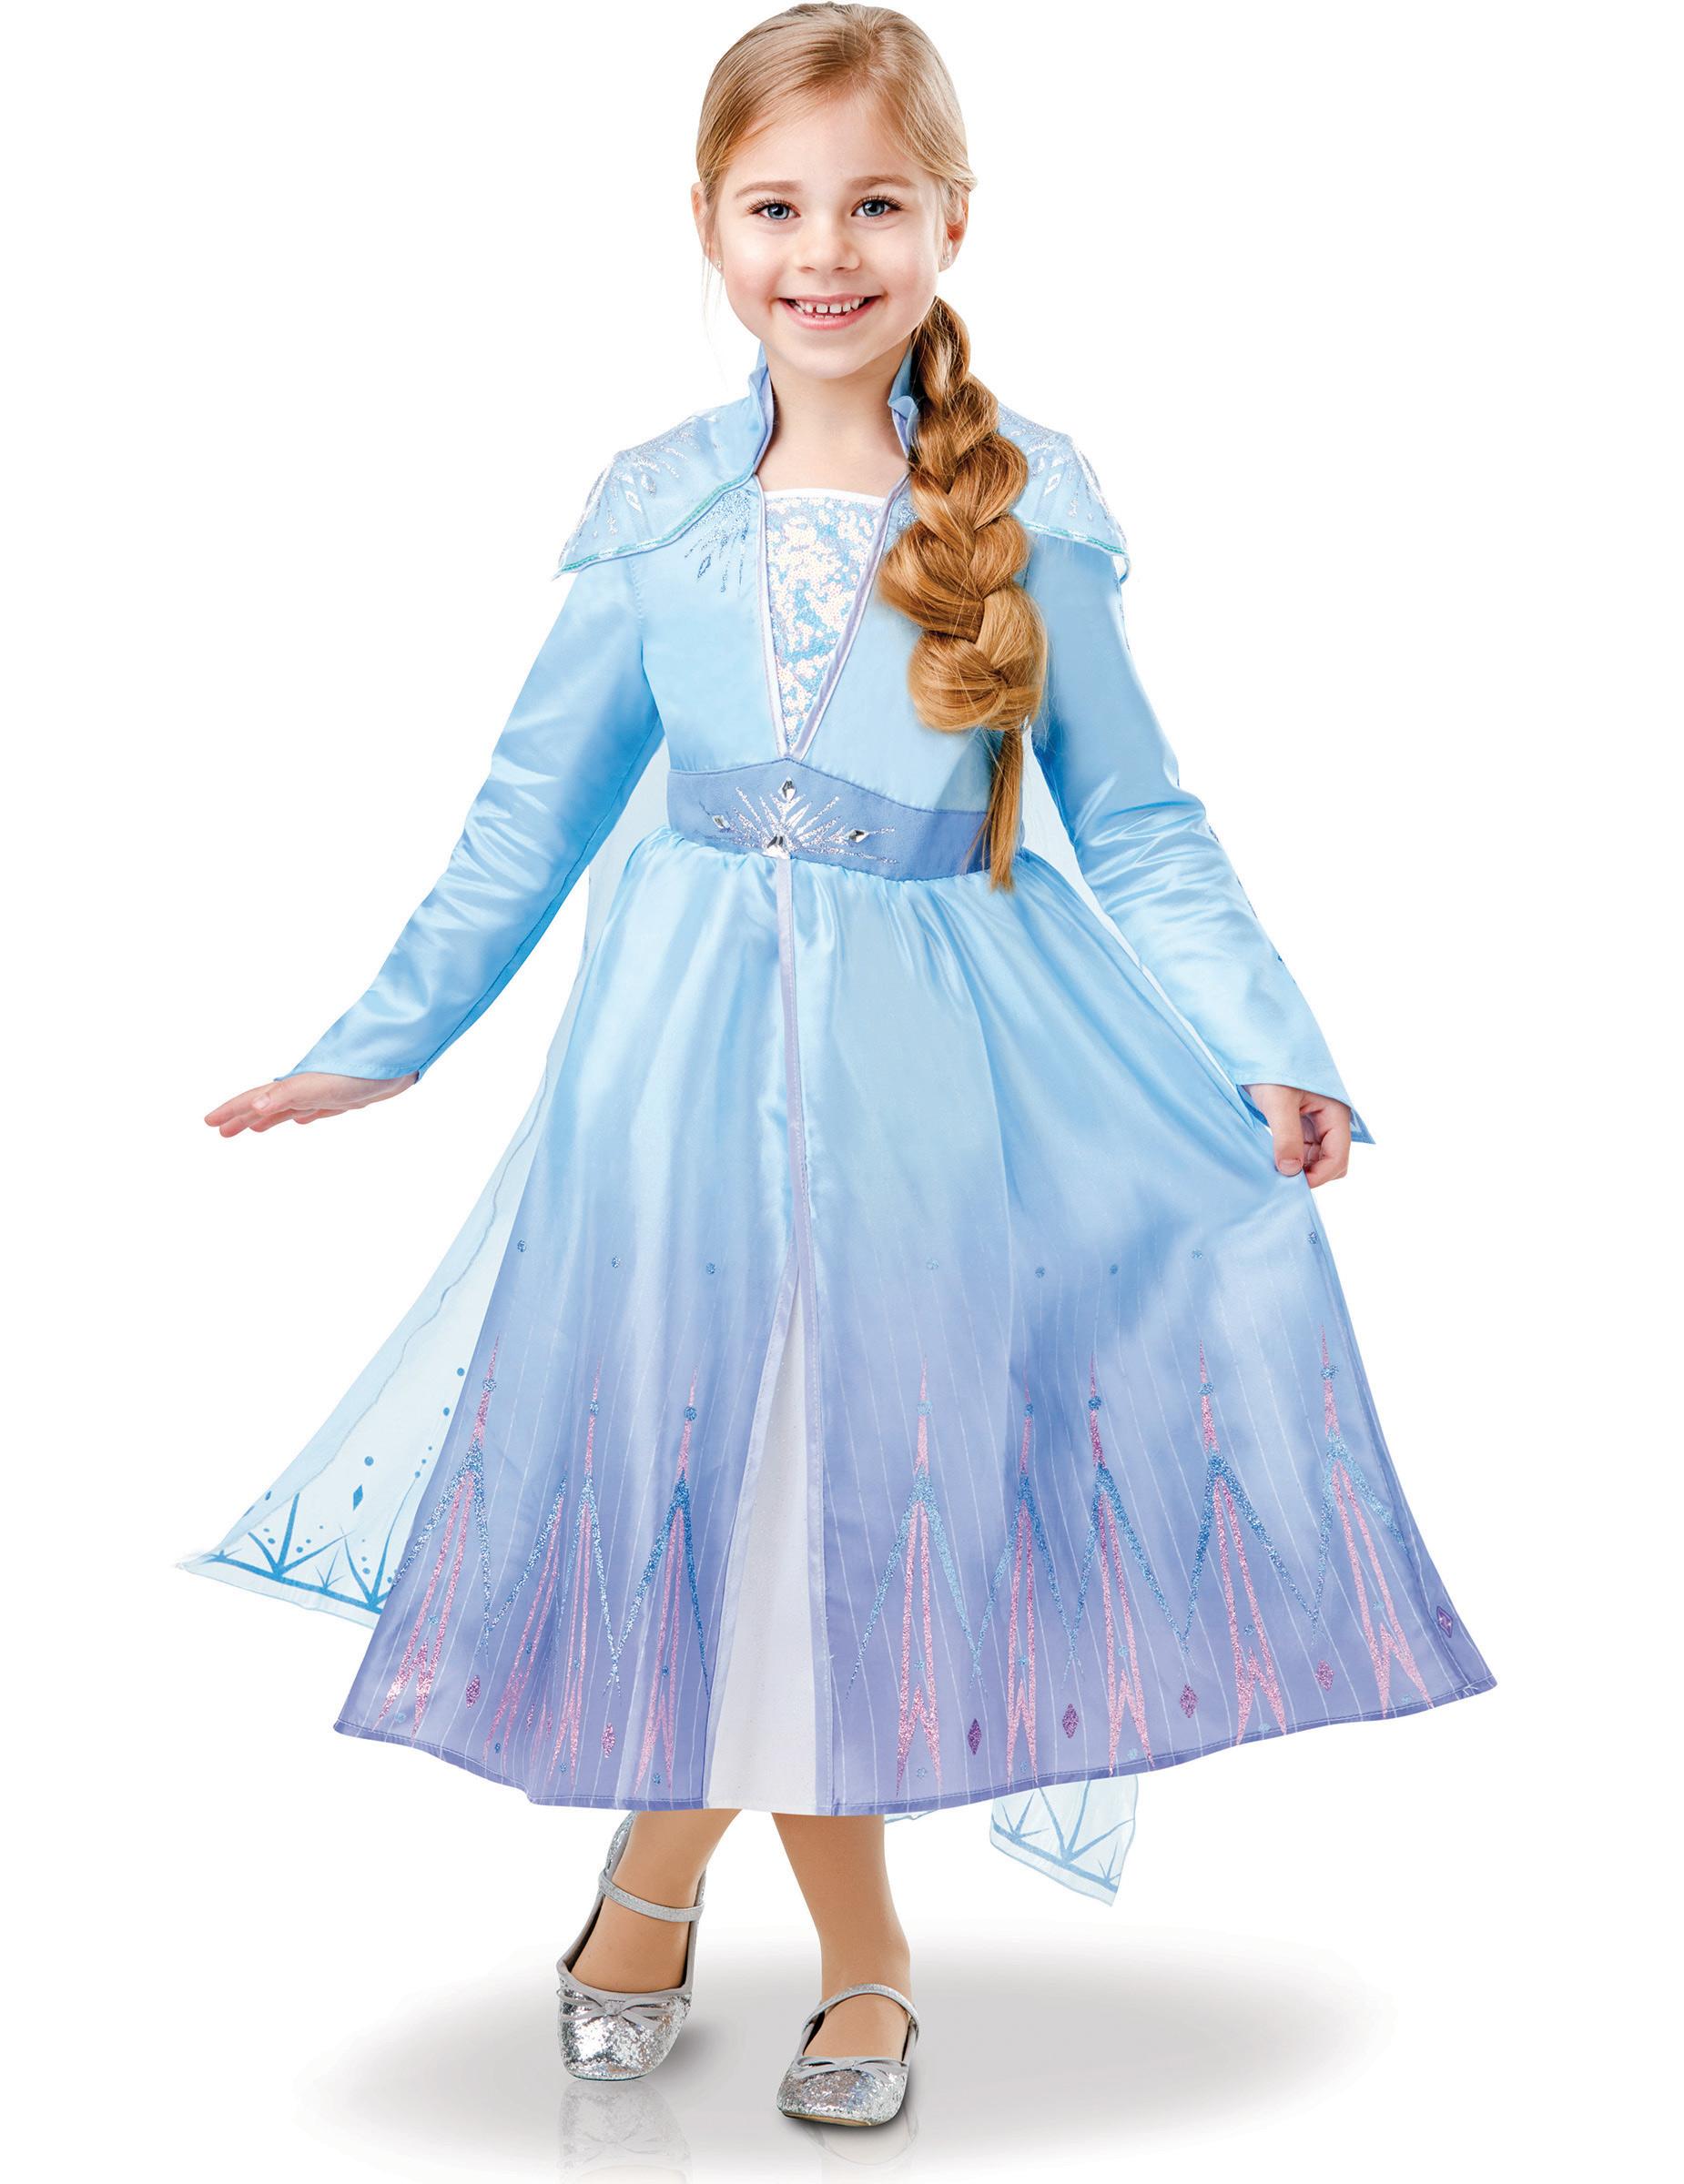 Frost 2 Elsa LYX klänning, Frozen